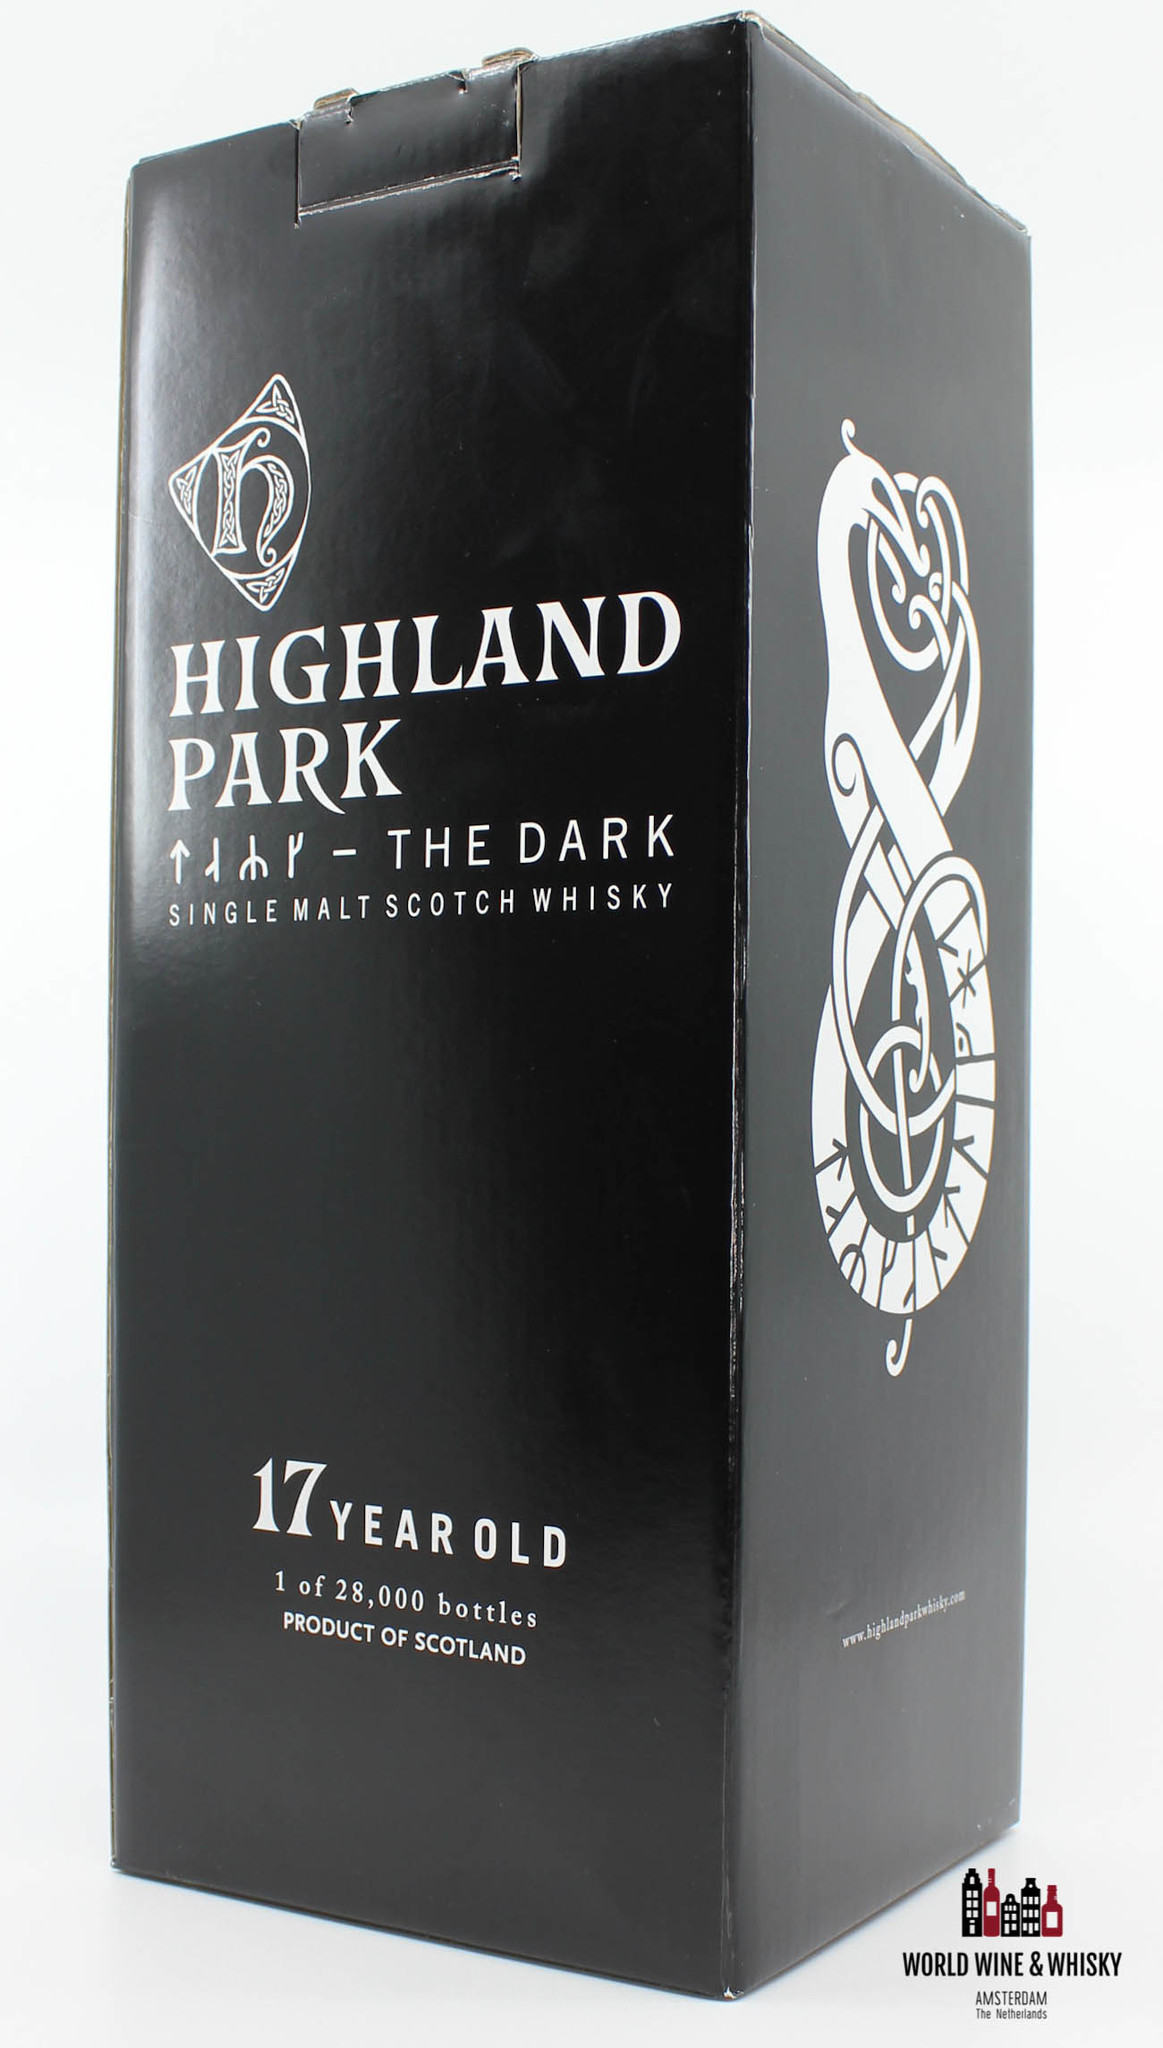 Highland Park Highland Park 17 Years Old 2000 2017 The Dark 52.9%